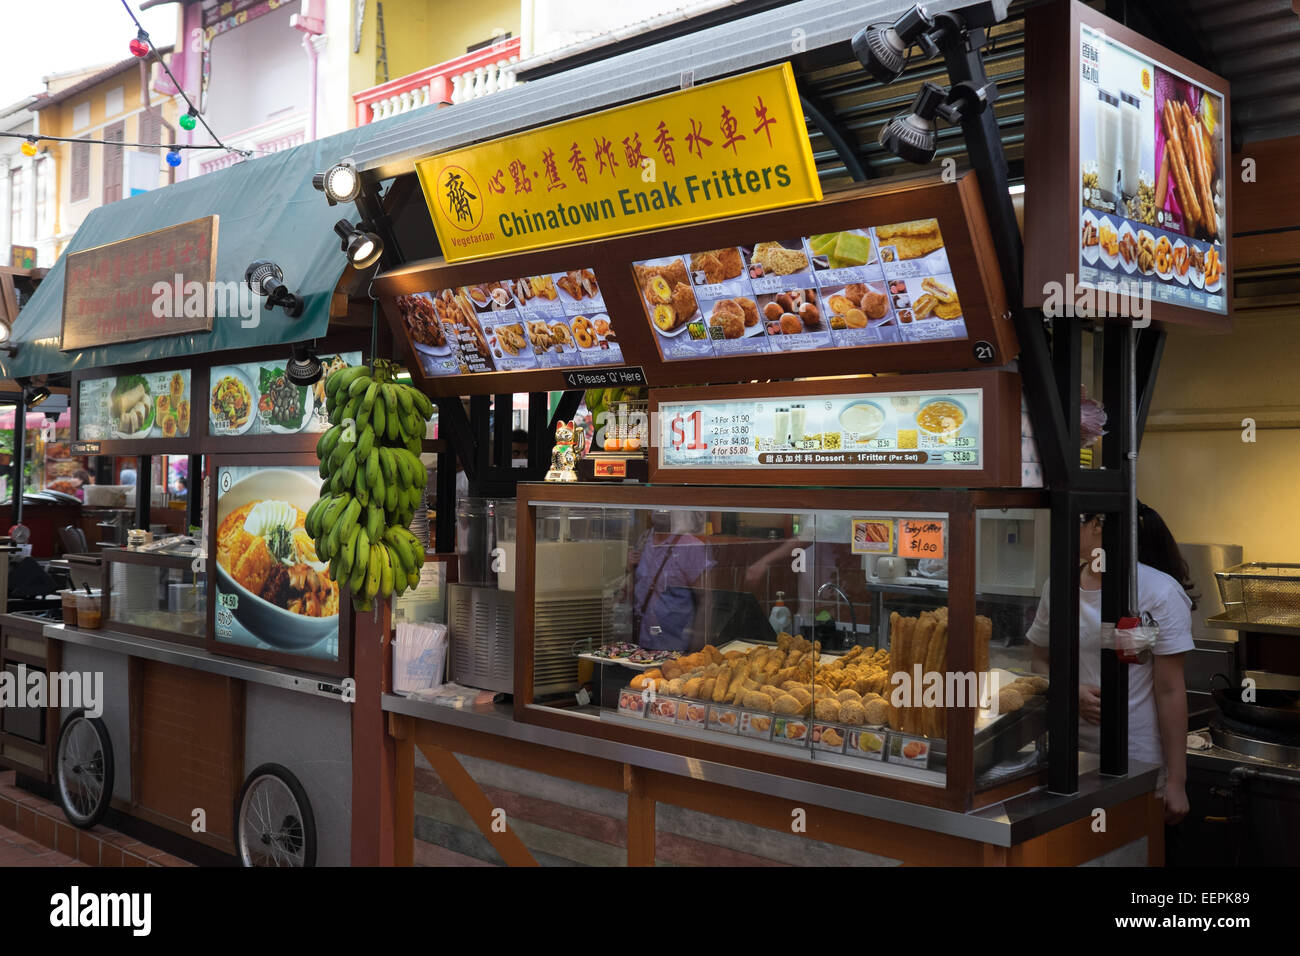 Chinatown Food Court